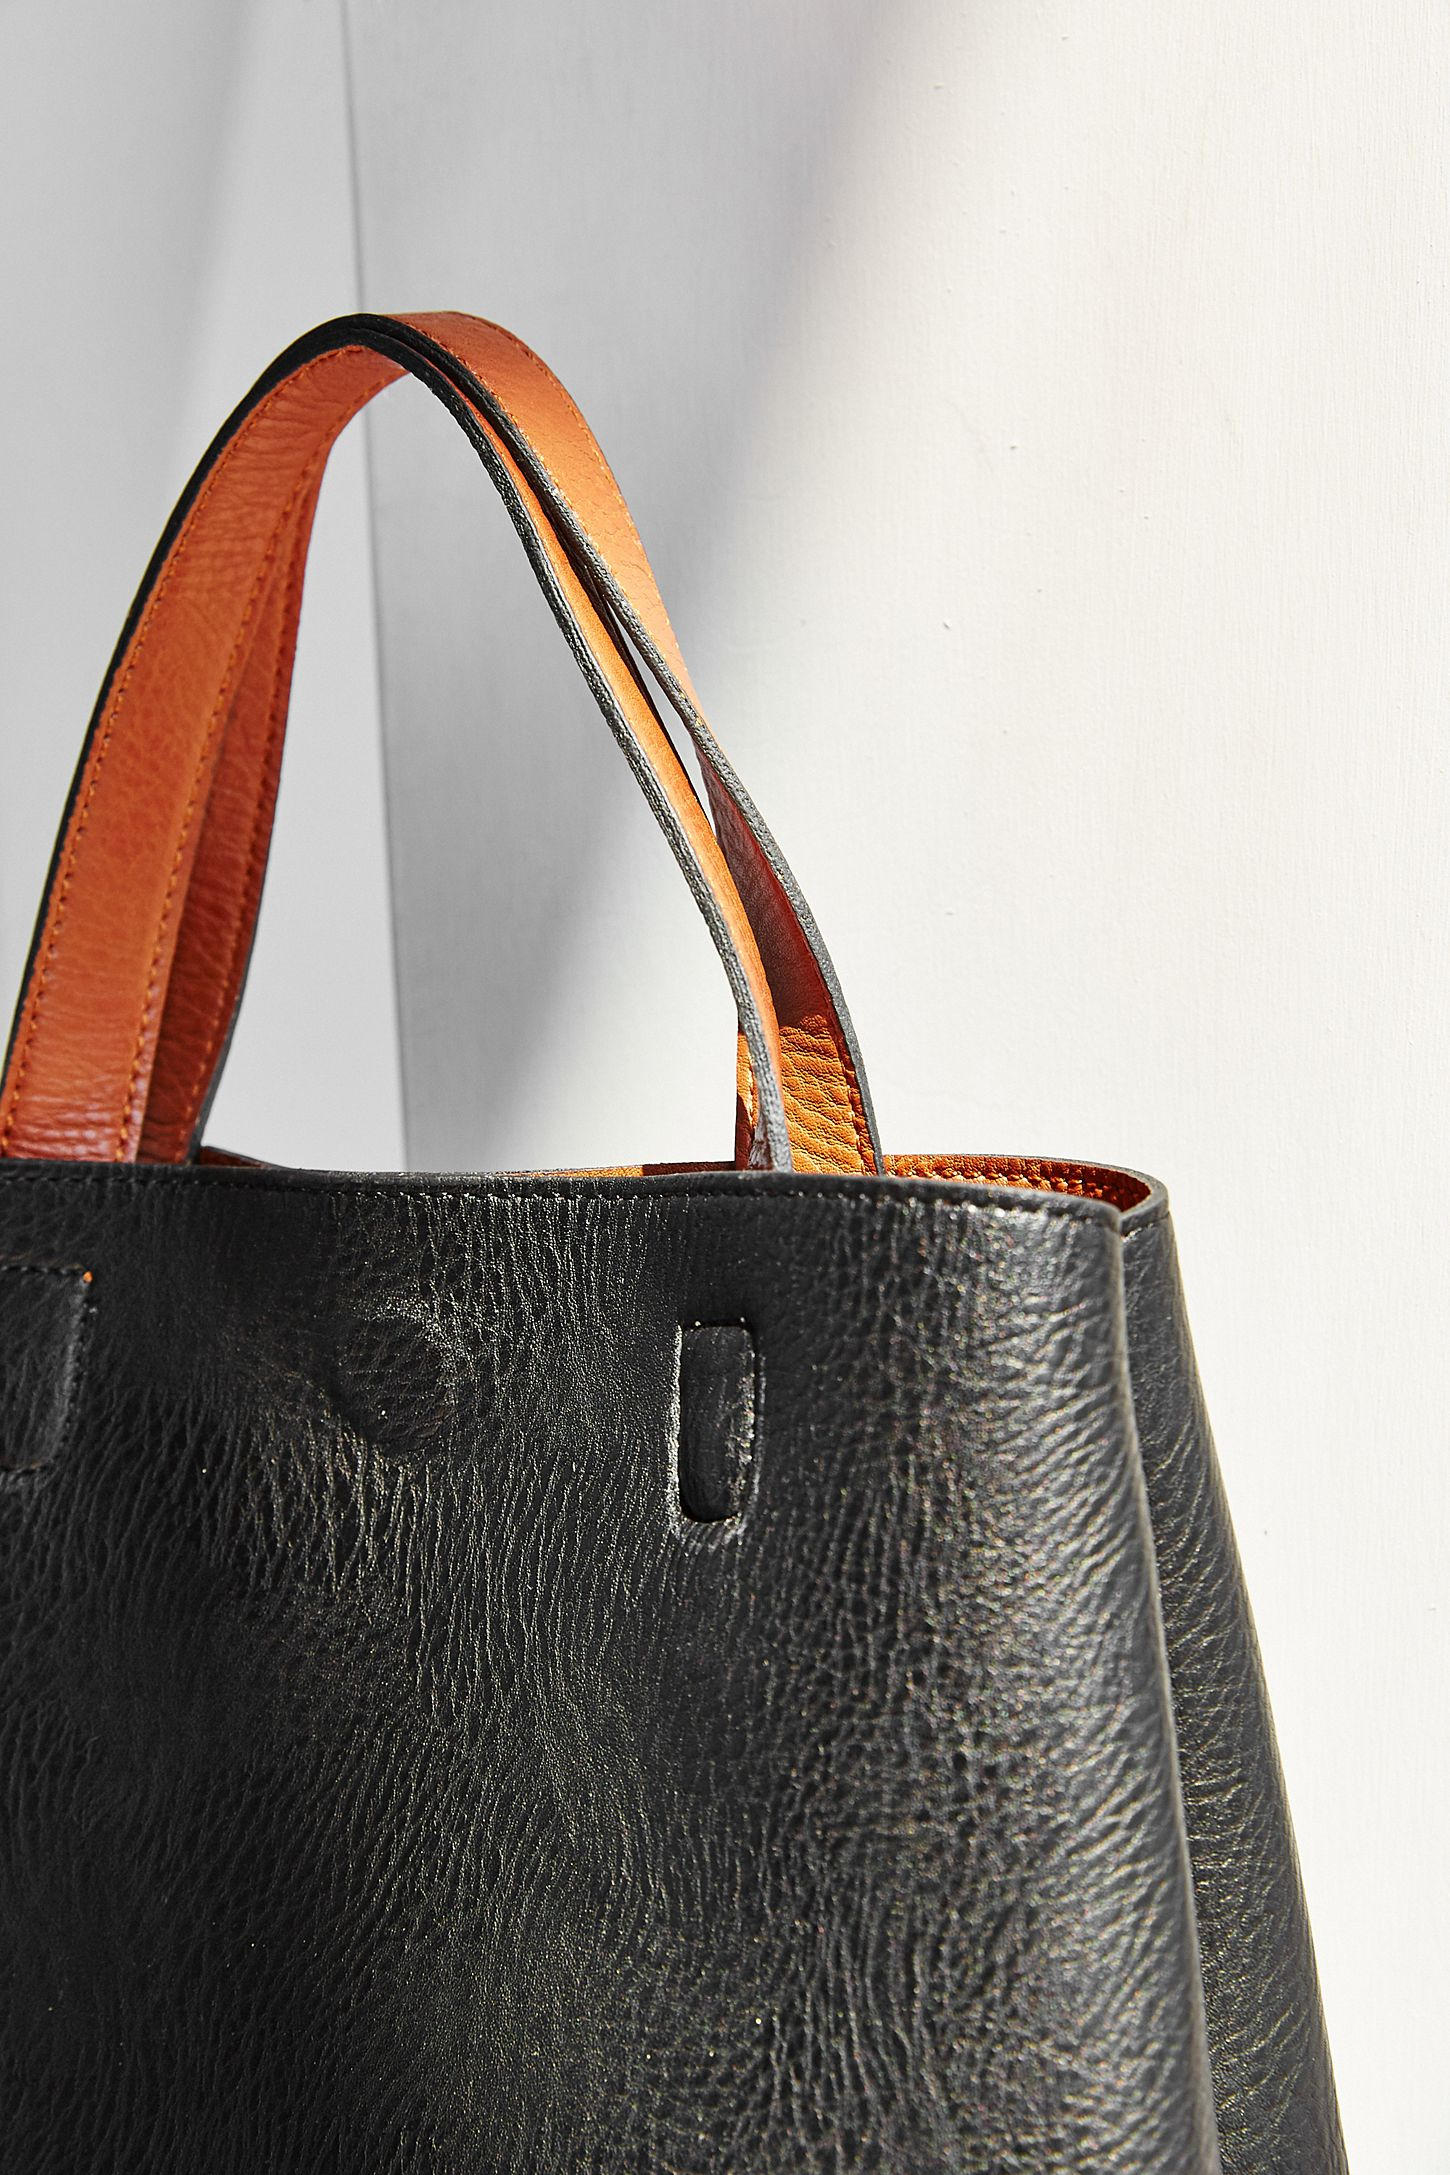 Slide View 3 Mini Reversible Faux Leather Tote Bag